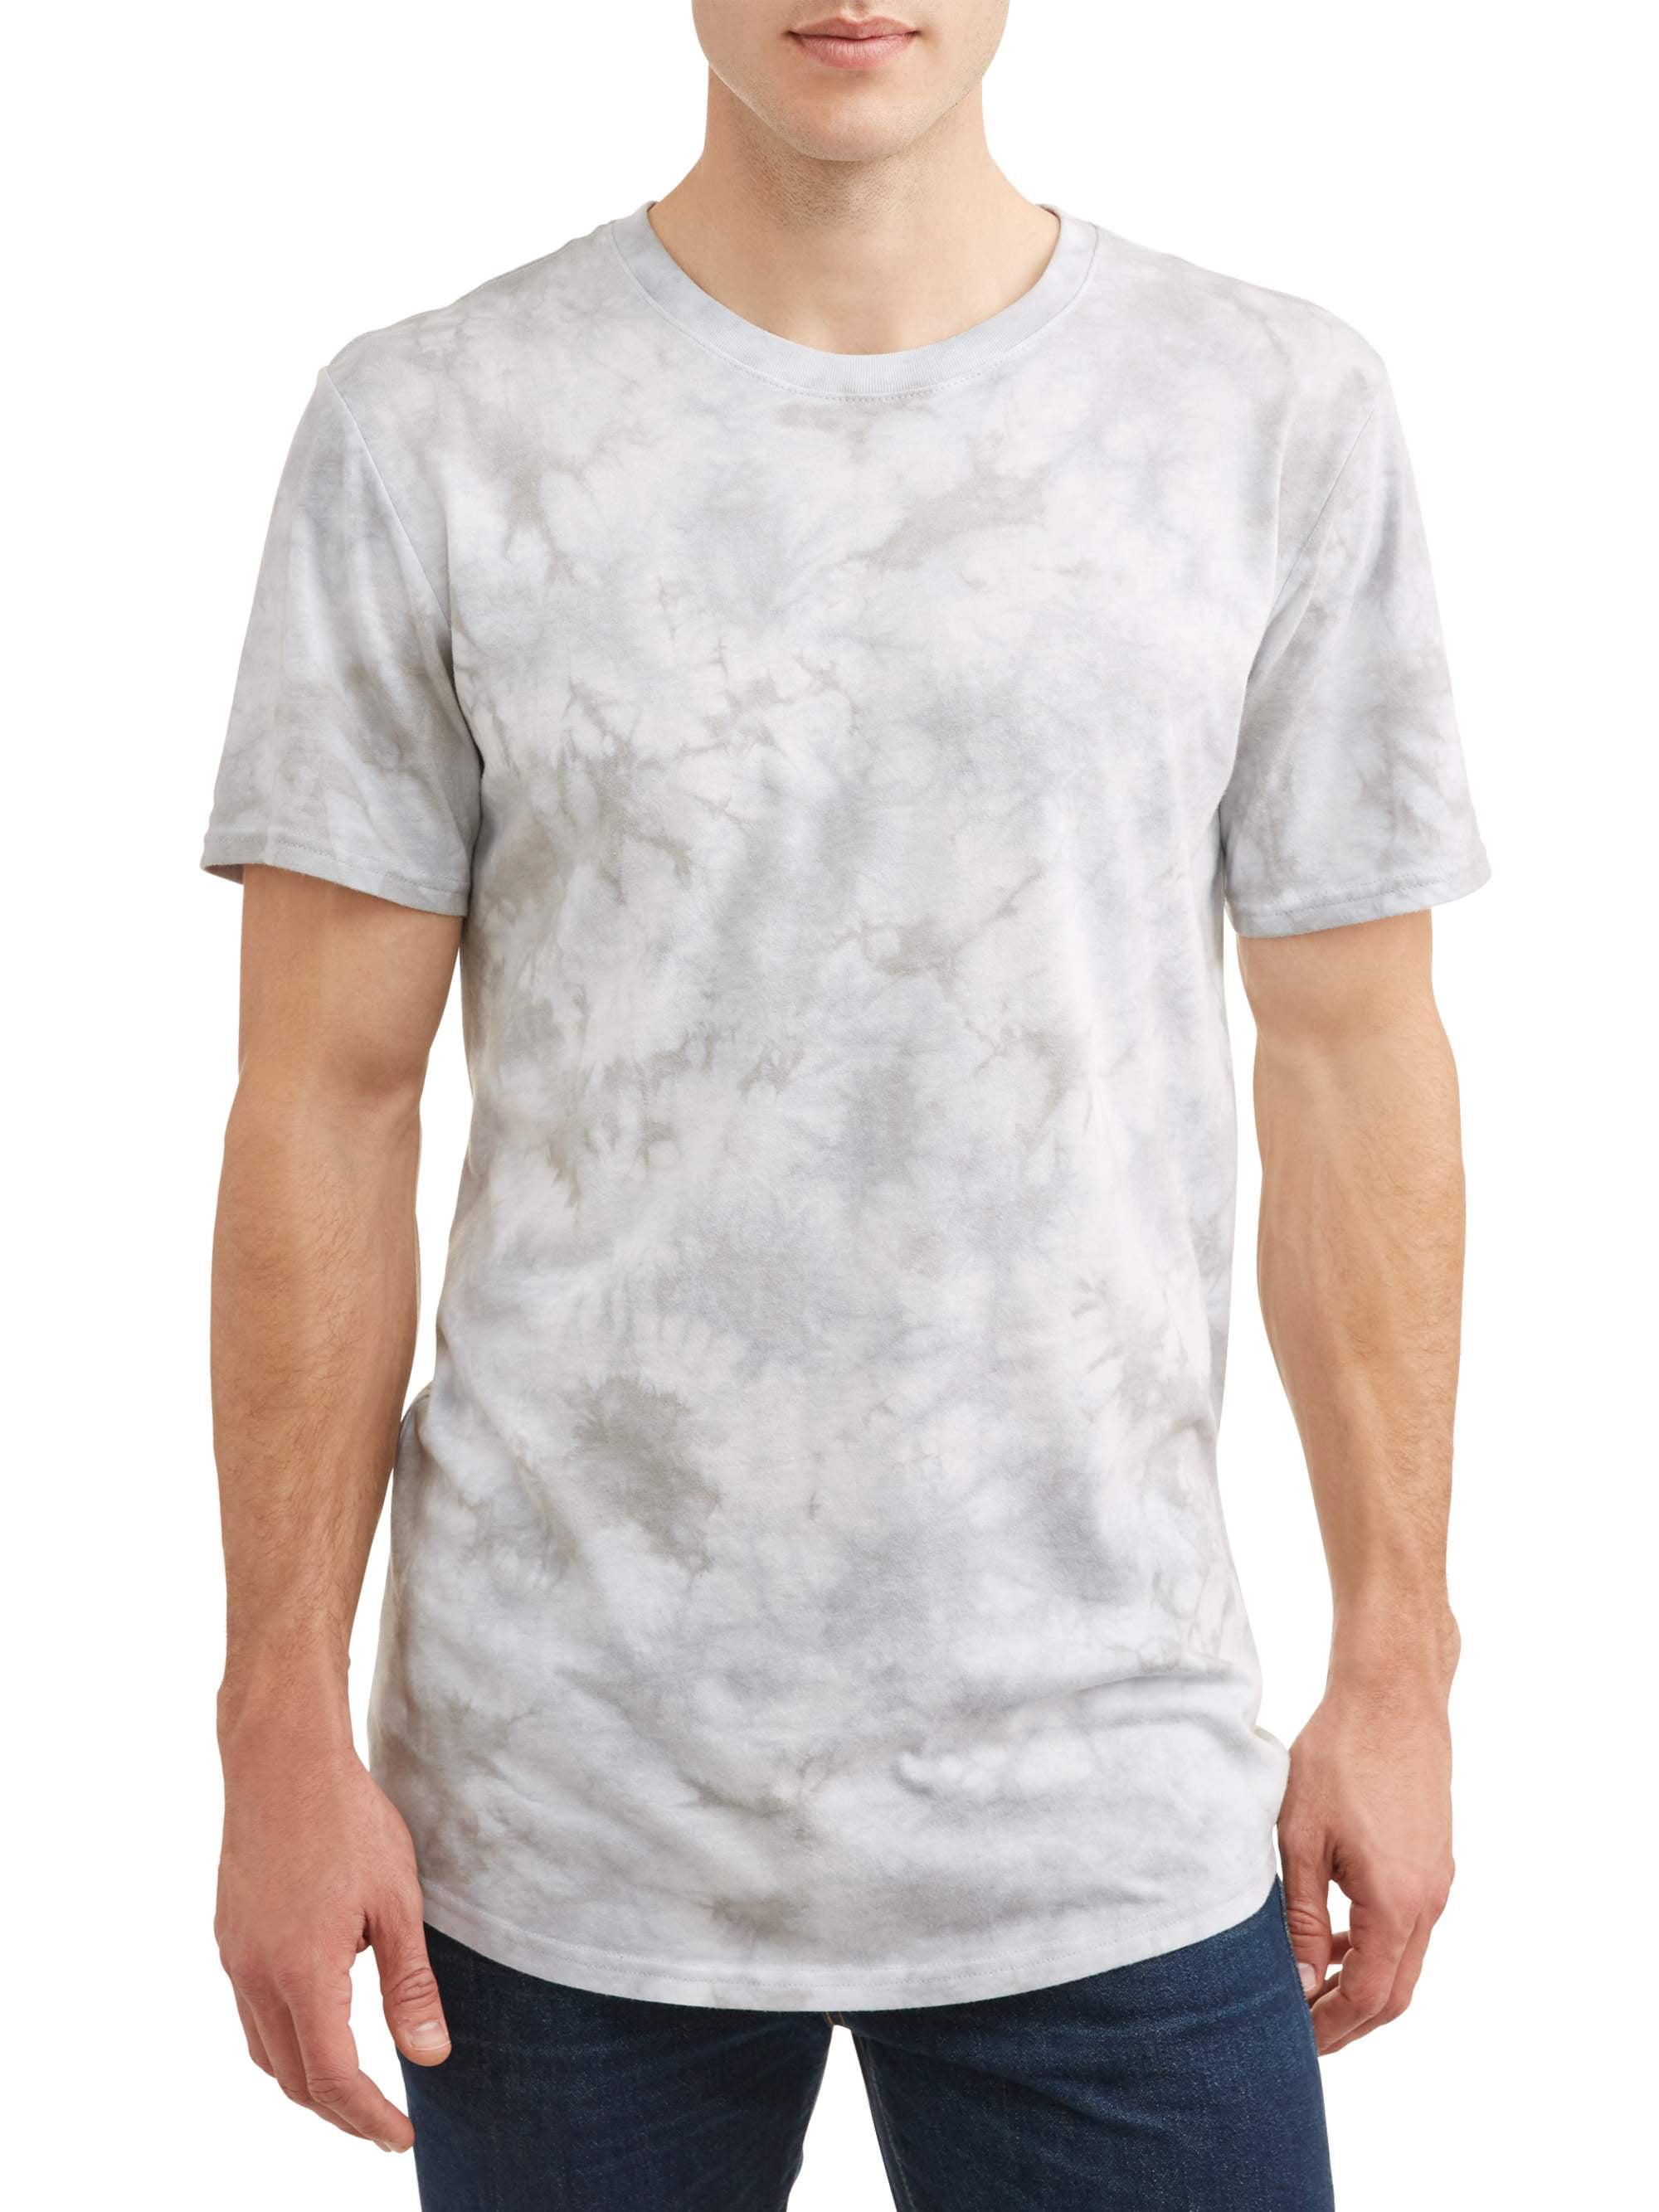 George - George Men's Elongated T-Shirt - Walmart